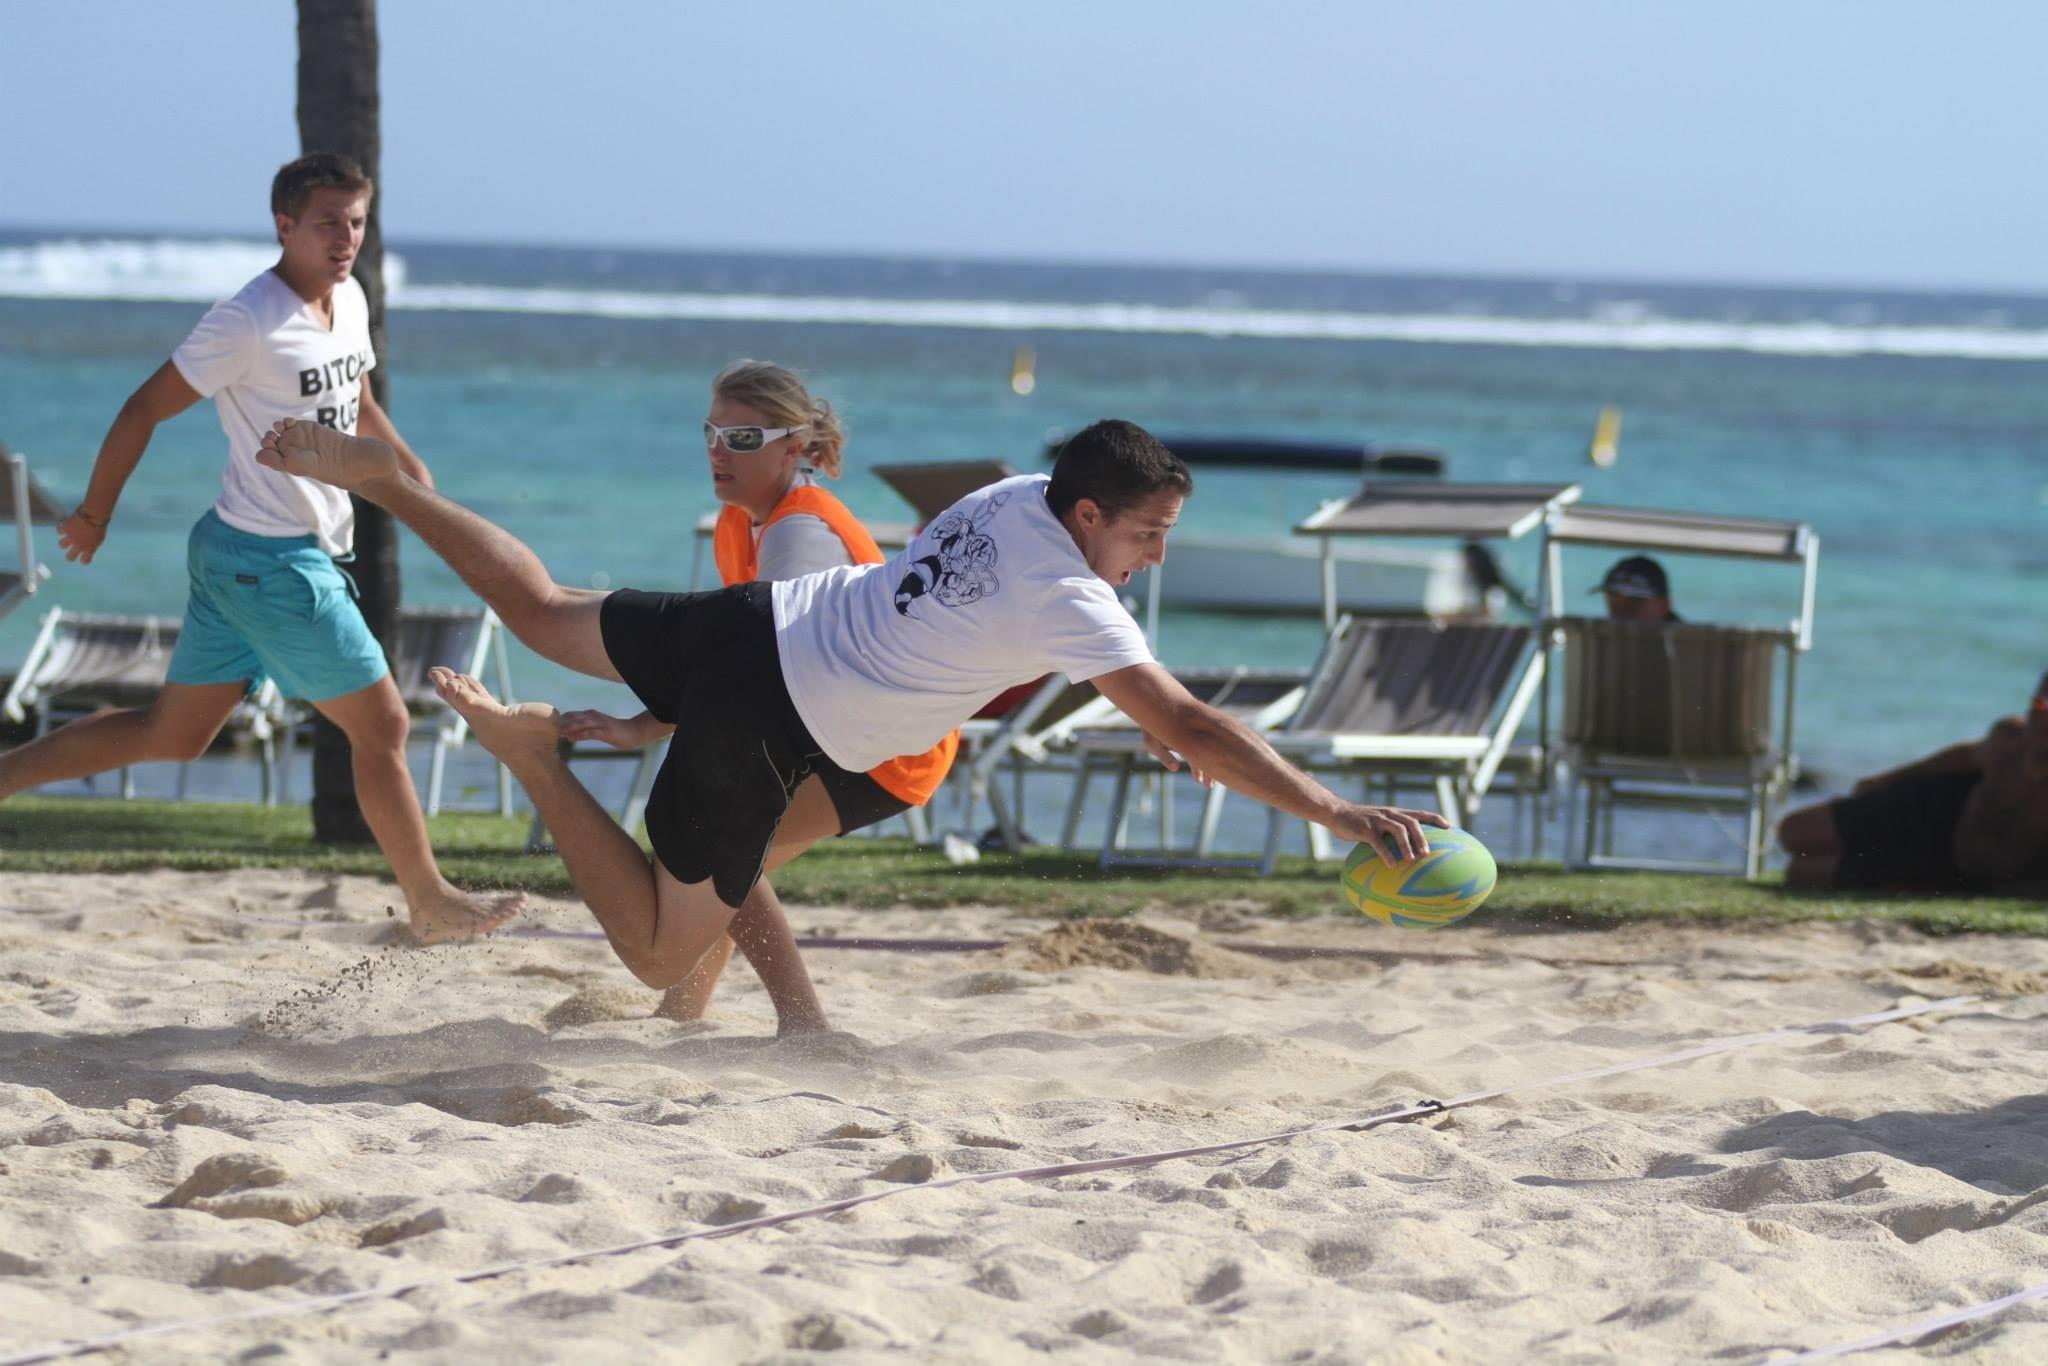 Le beach touch rugby, c'est ce samedi